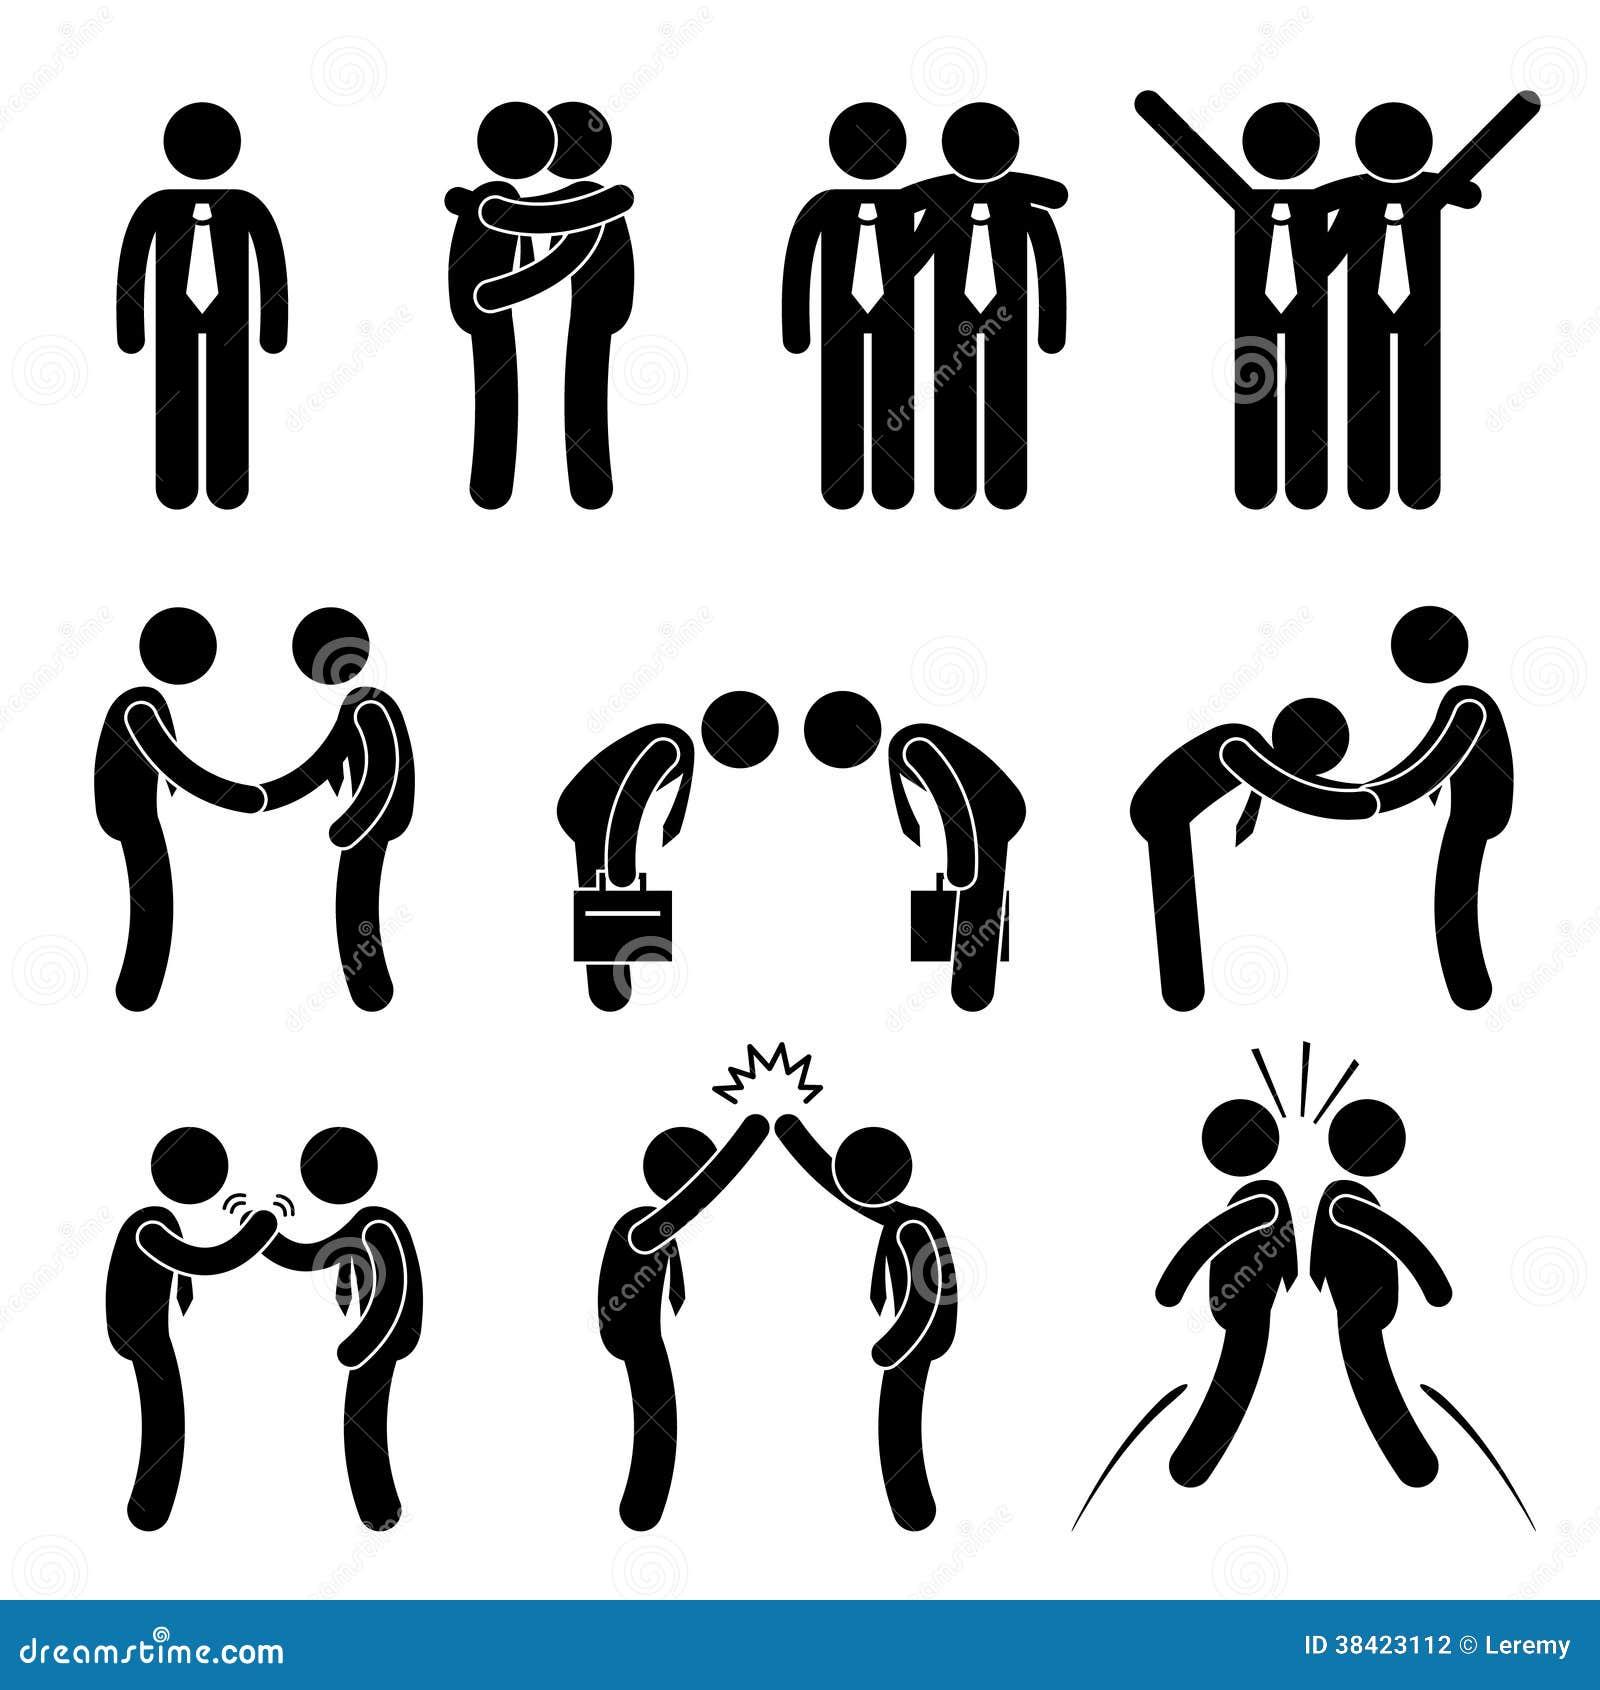 Fichas Letras D Y L besides Photographie Stock Geste De Salutations De Gestion D Affaires Image38423112 in addition Atividades Silabicas Letra E Pra Ler E Escrever also Moutarde as well Dia Circo Atividades Educacao Infantil. on 1148